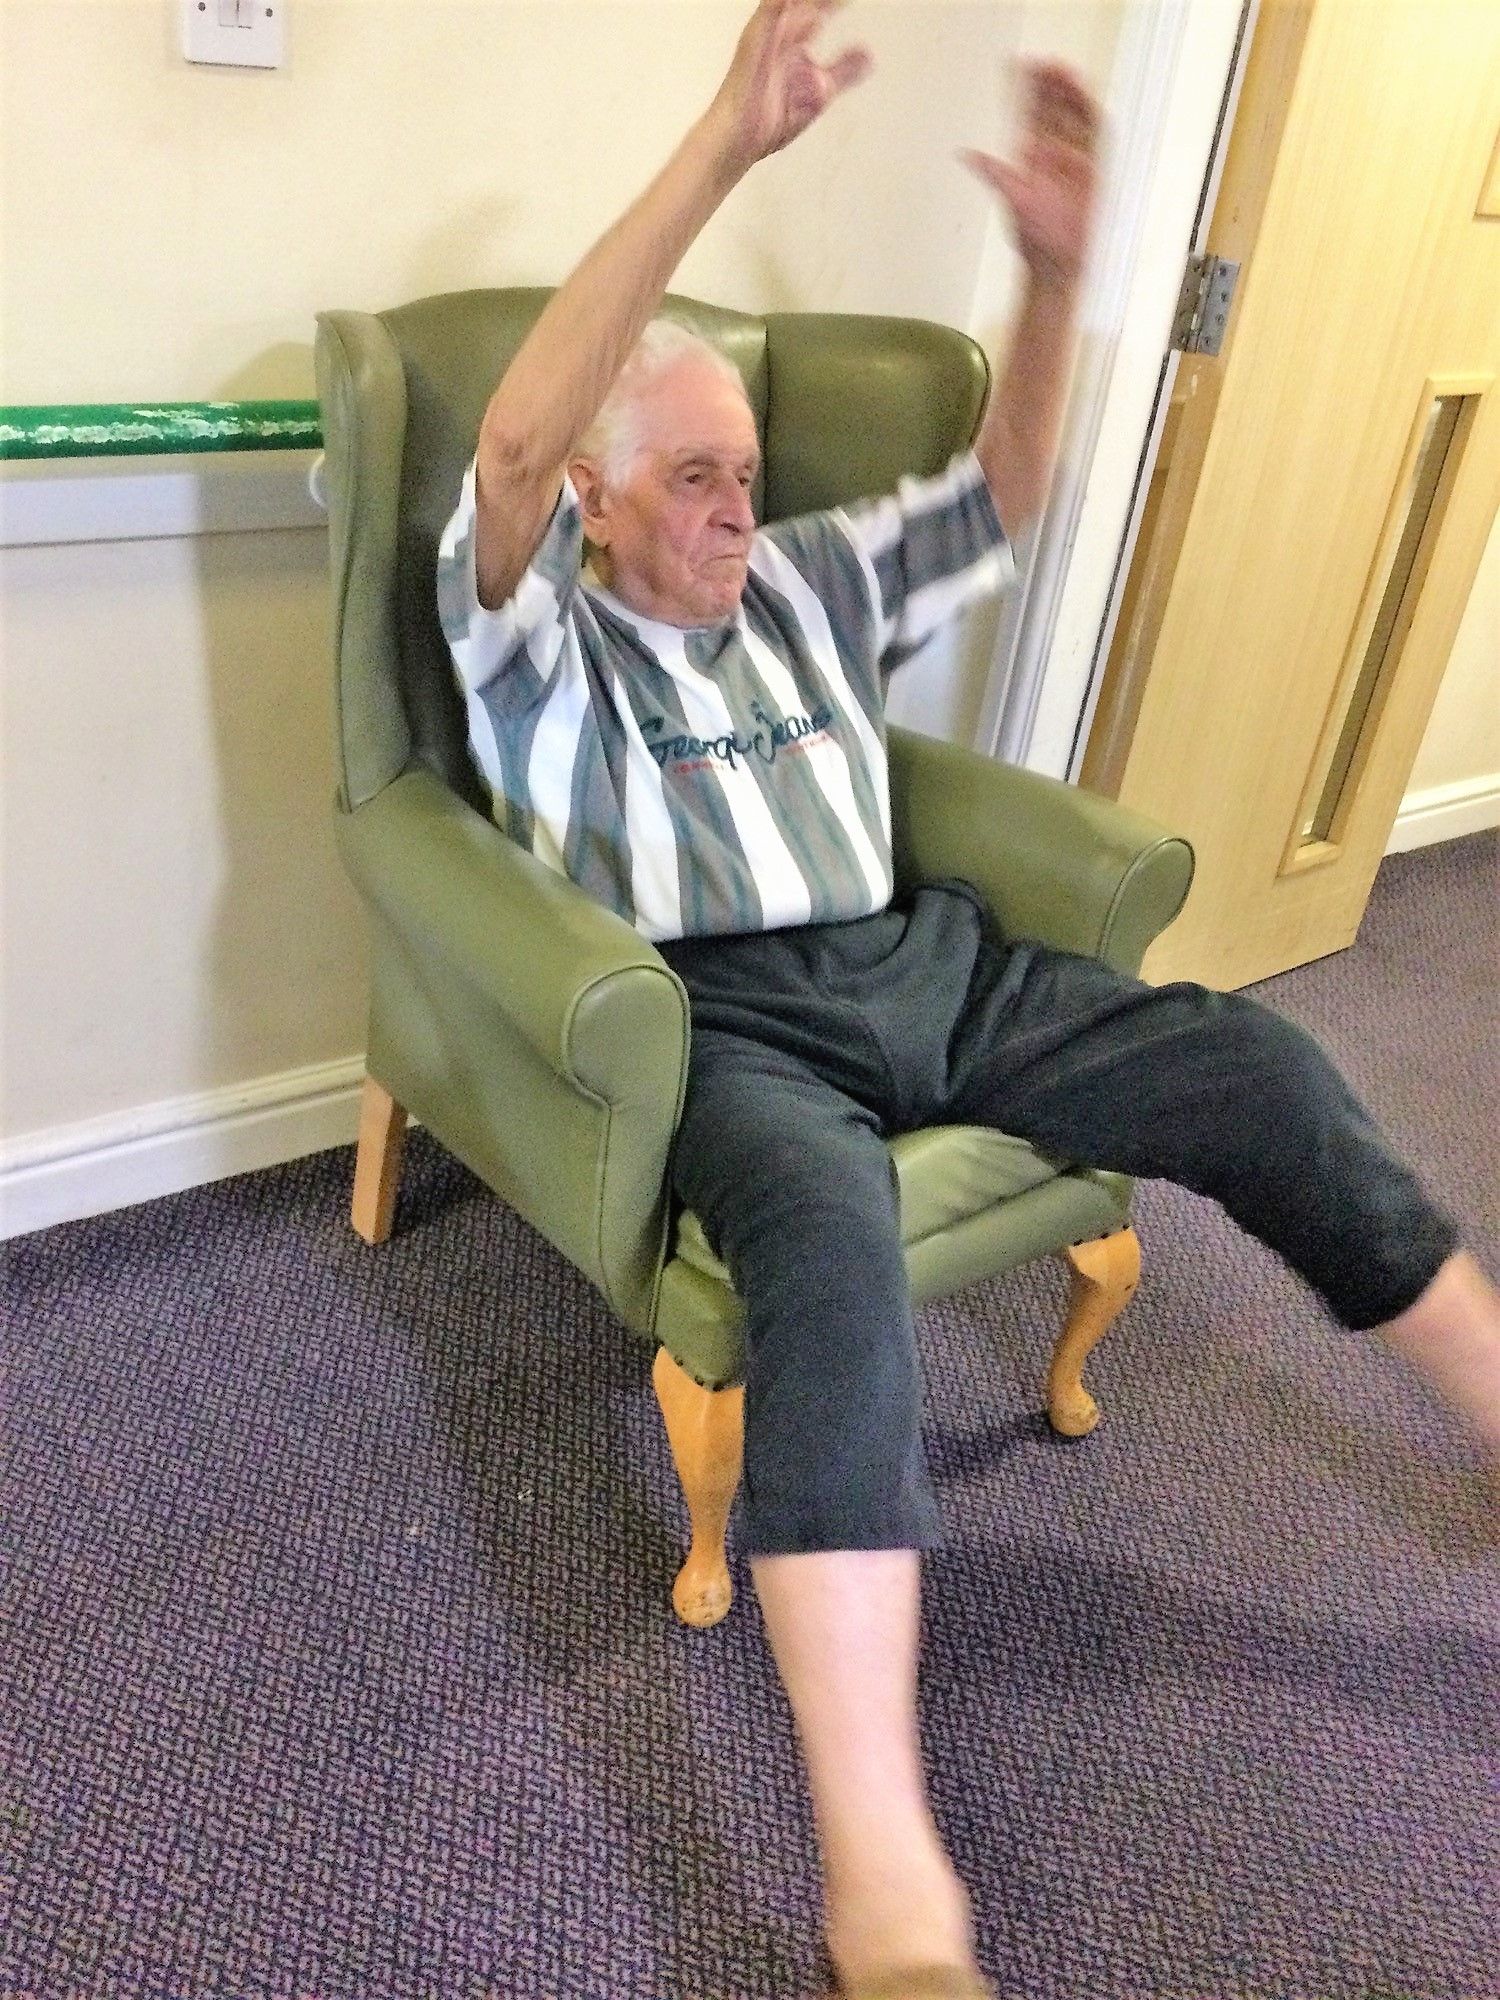 Armchair exercise